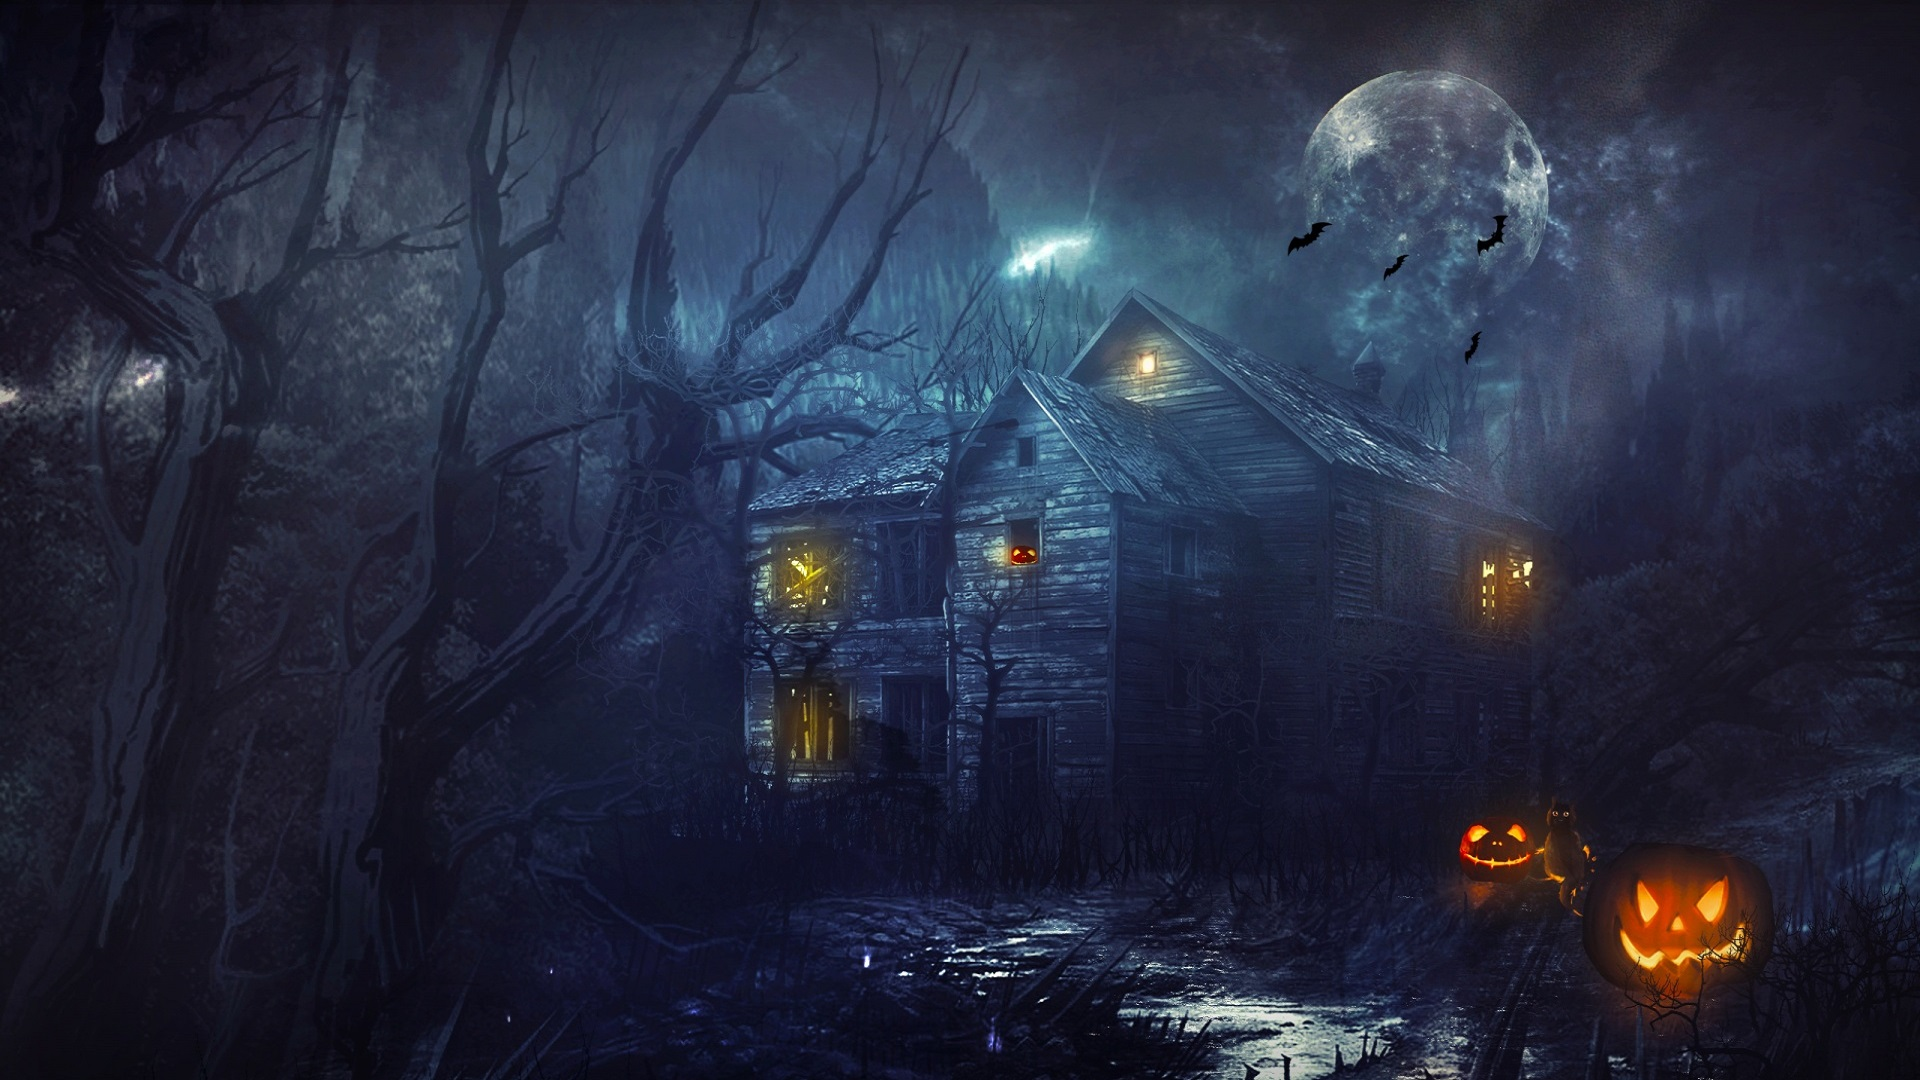 Halloween Background   Free Wallpapers   Pinterest   Haunted